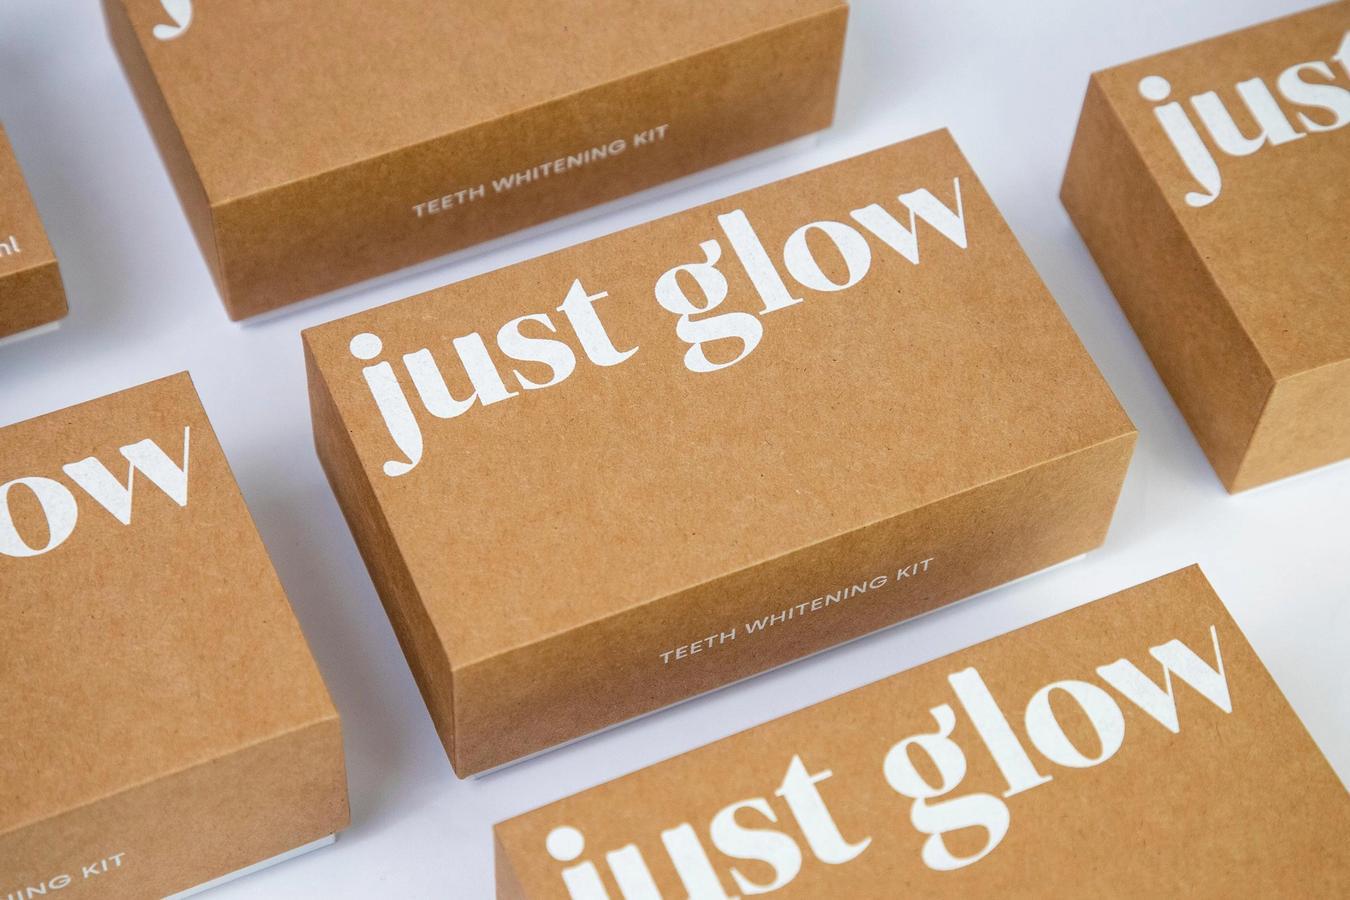 Multiple Just Glow Teeth Whitening Kits